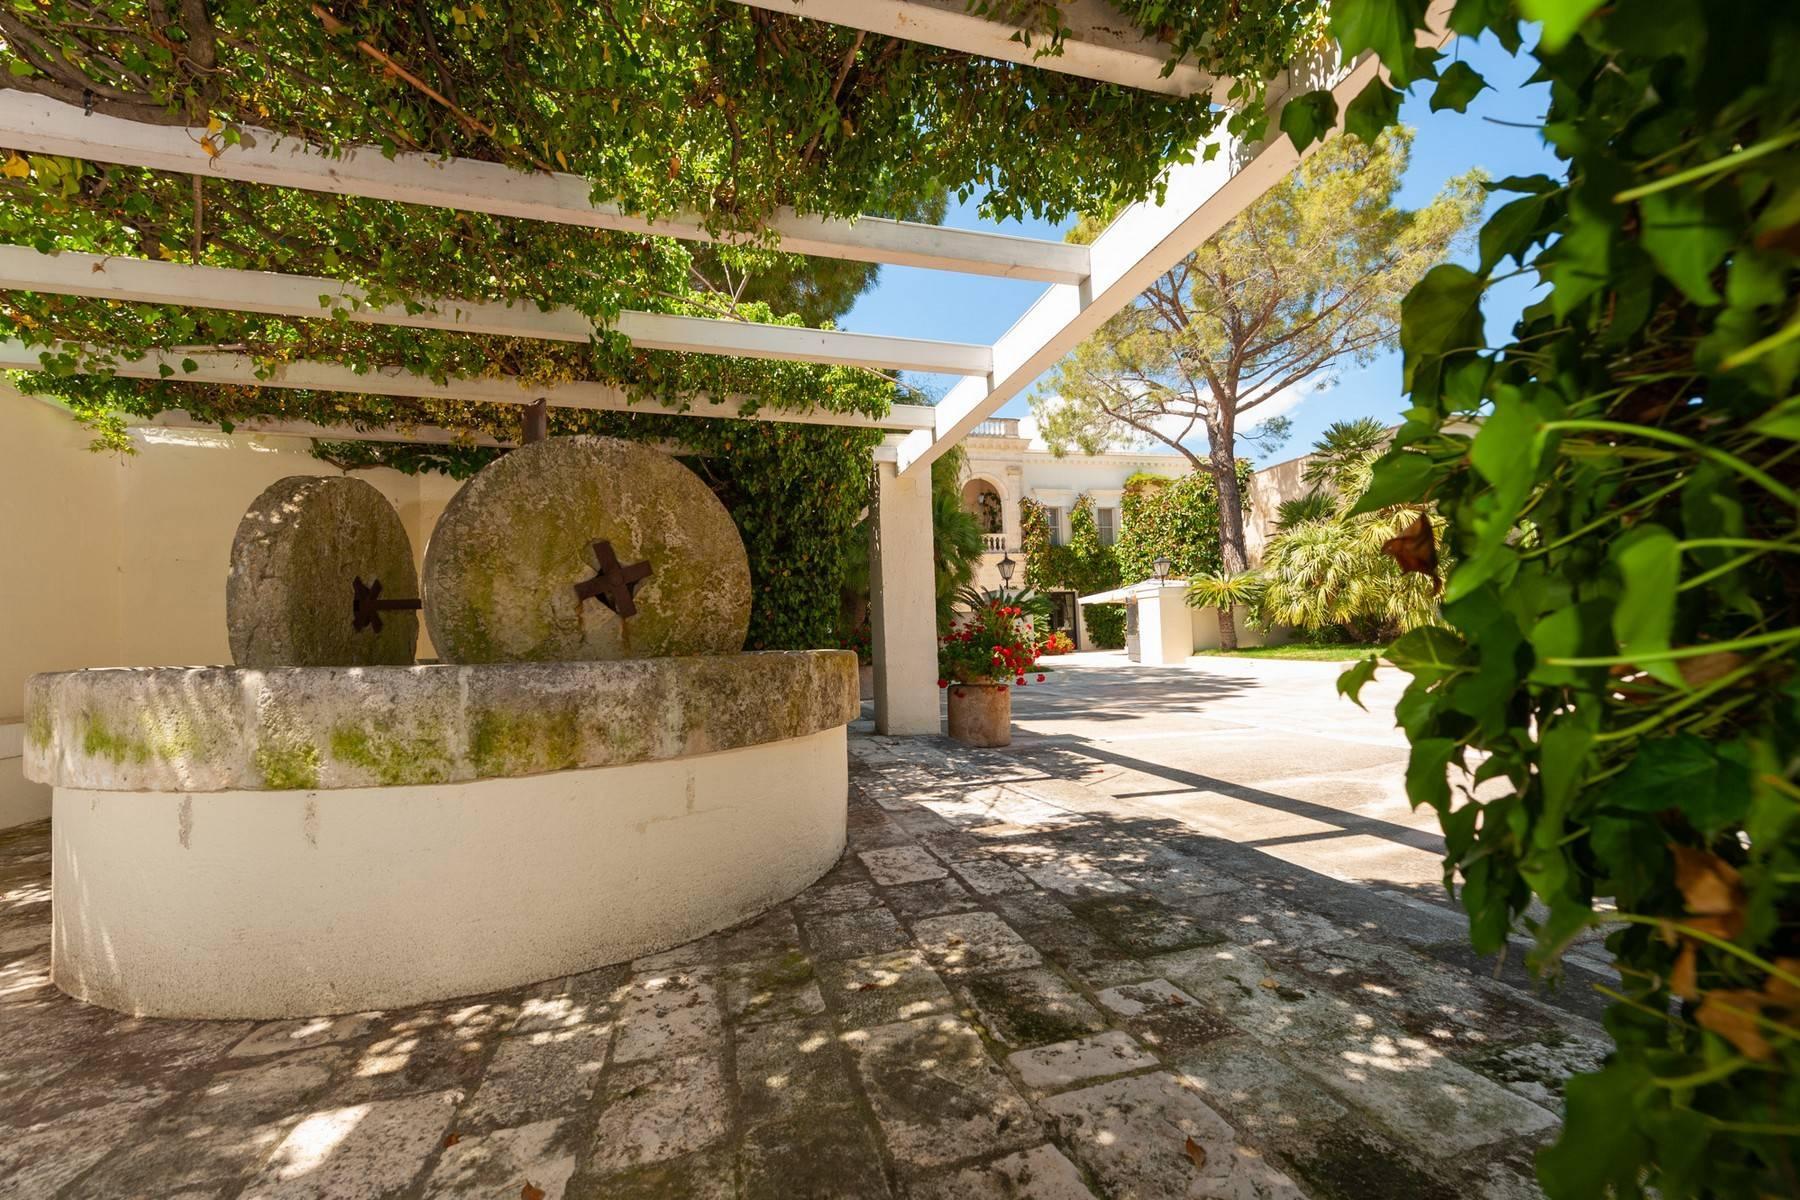 Splendida villa gentilizia del '600 circondata da agrumeti - 18